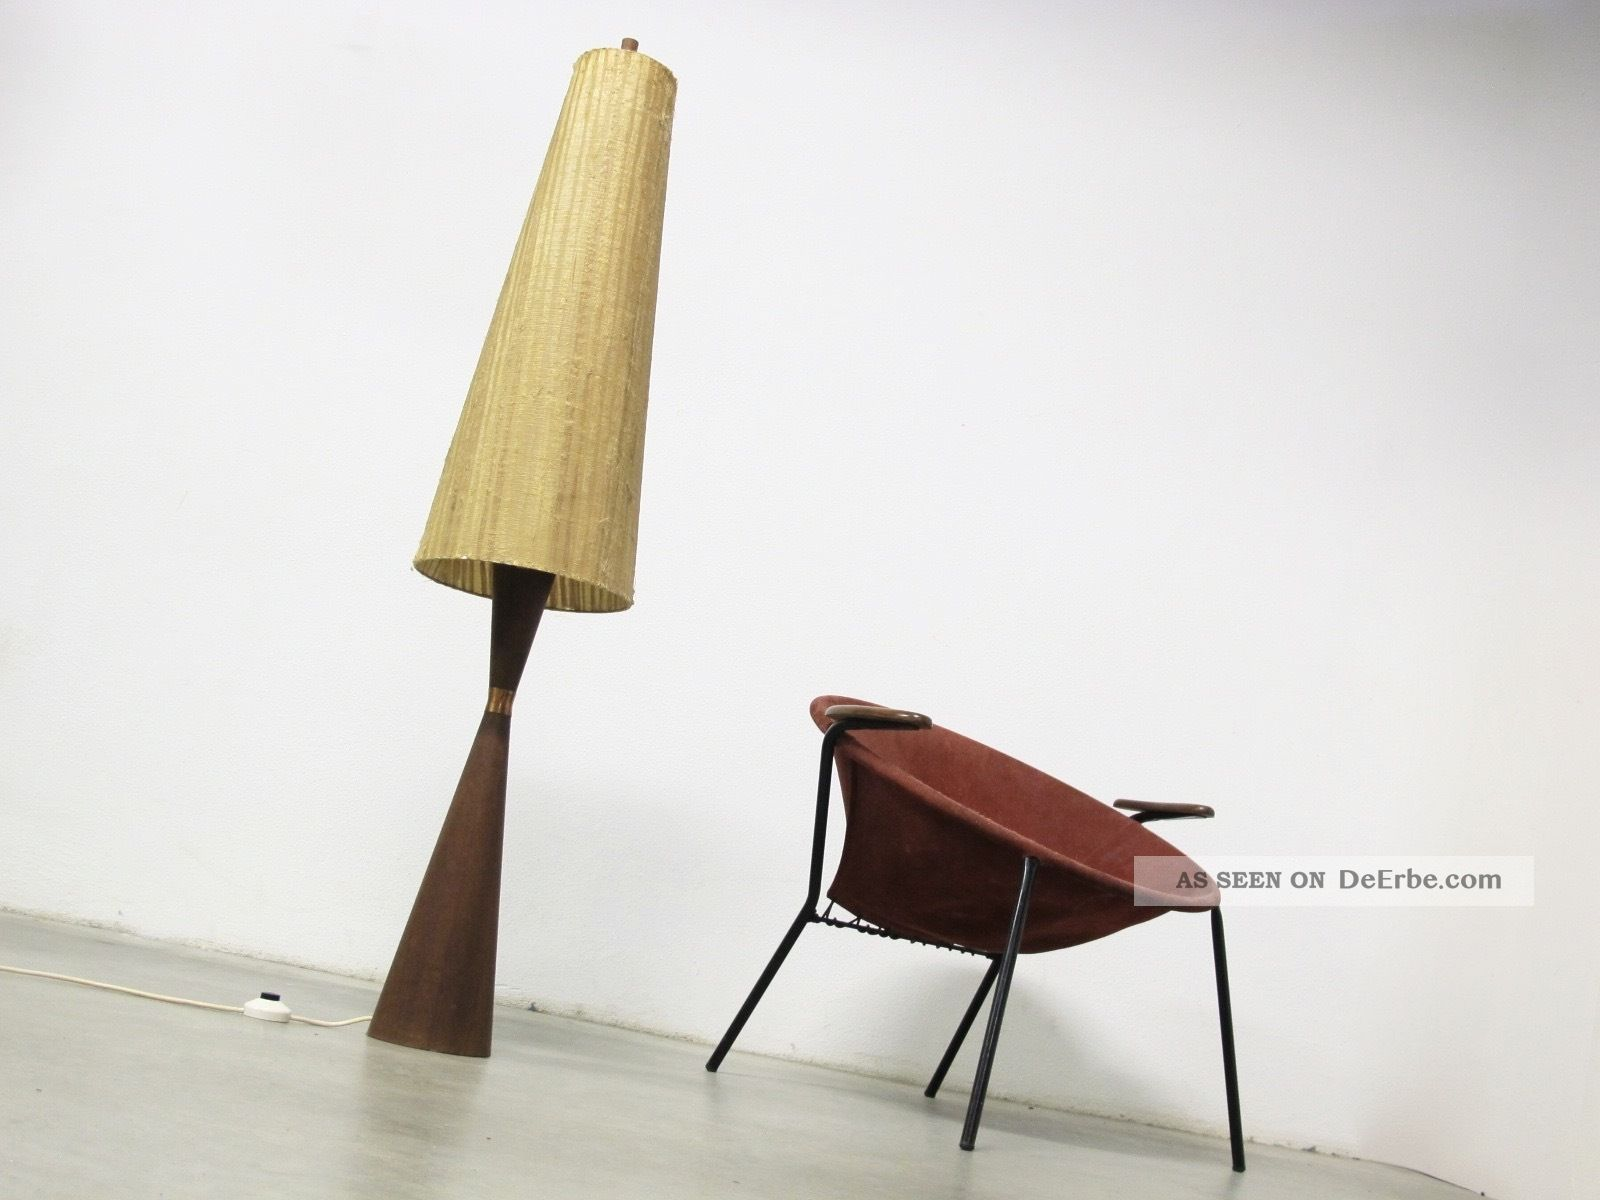 50s Teak Diabolo Floor Lamp Midcentury Stehlampe Fog Morup Denmark Danish 1950-1959 Bild